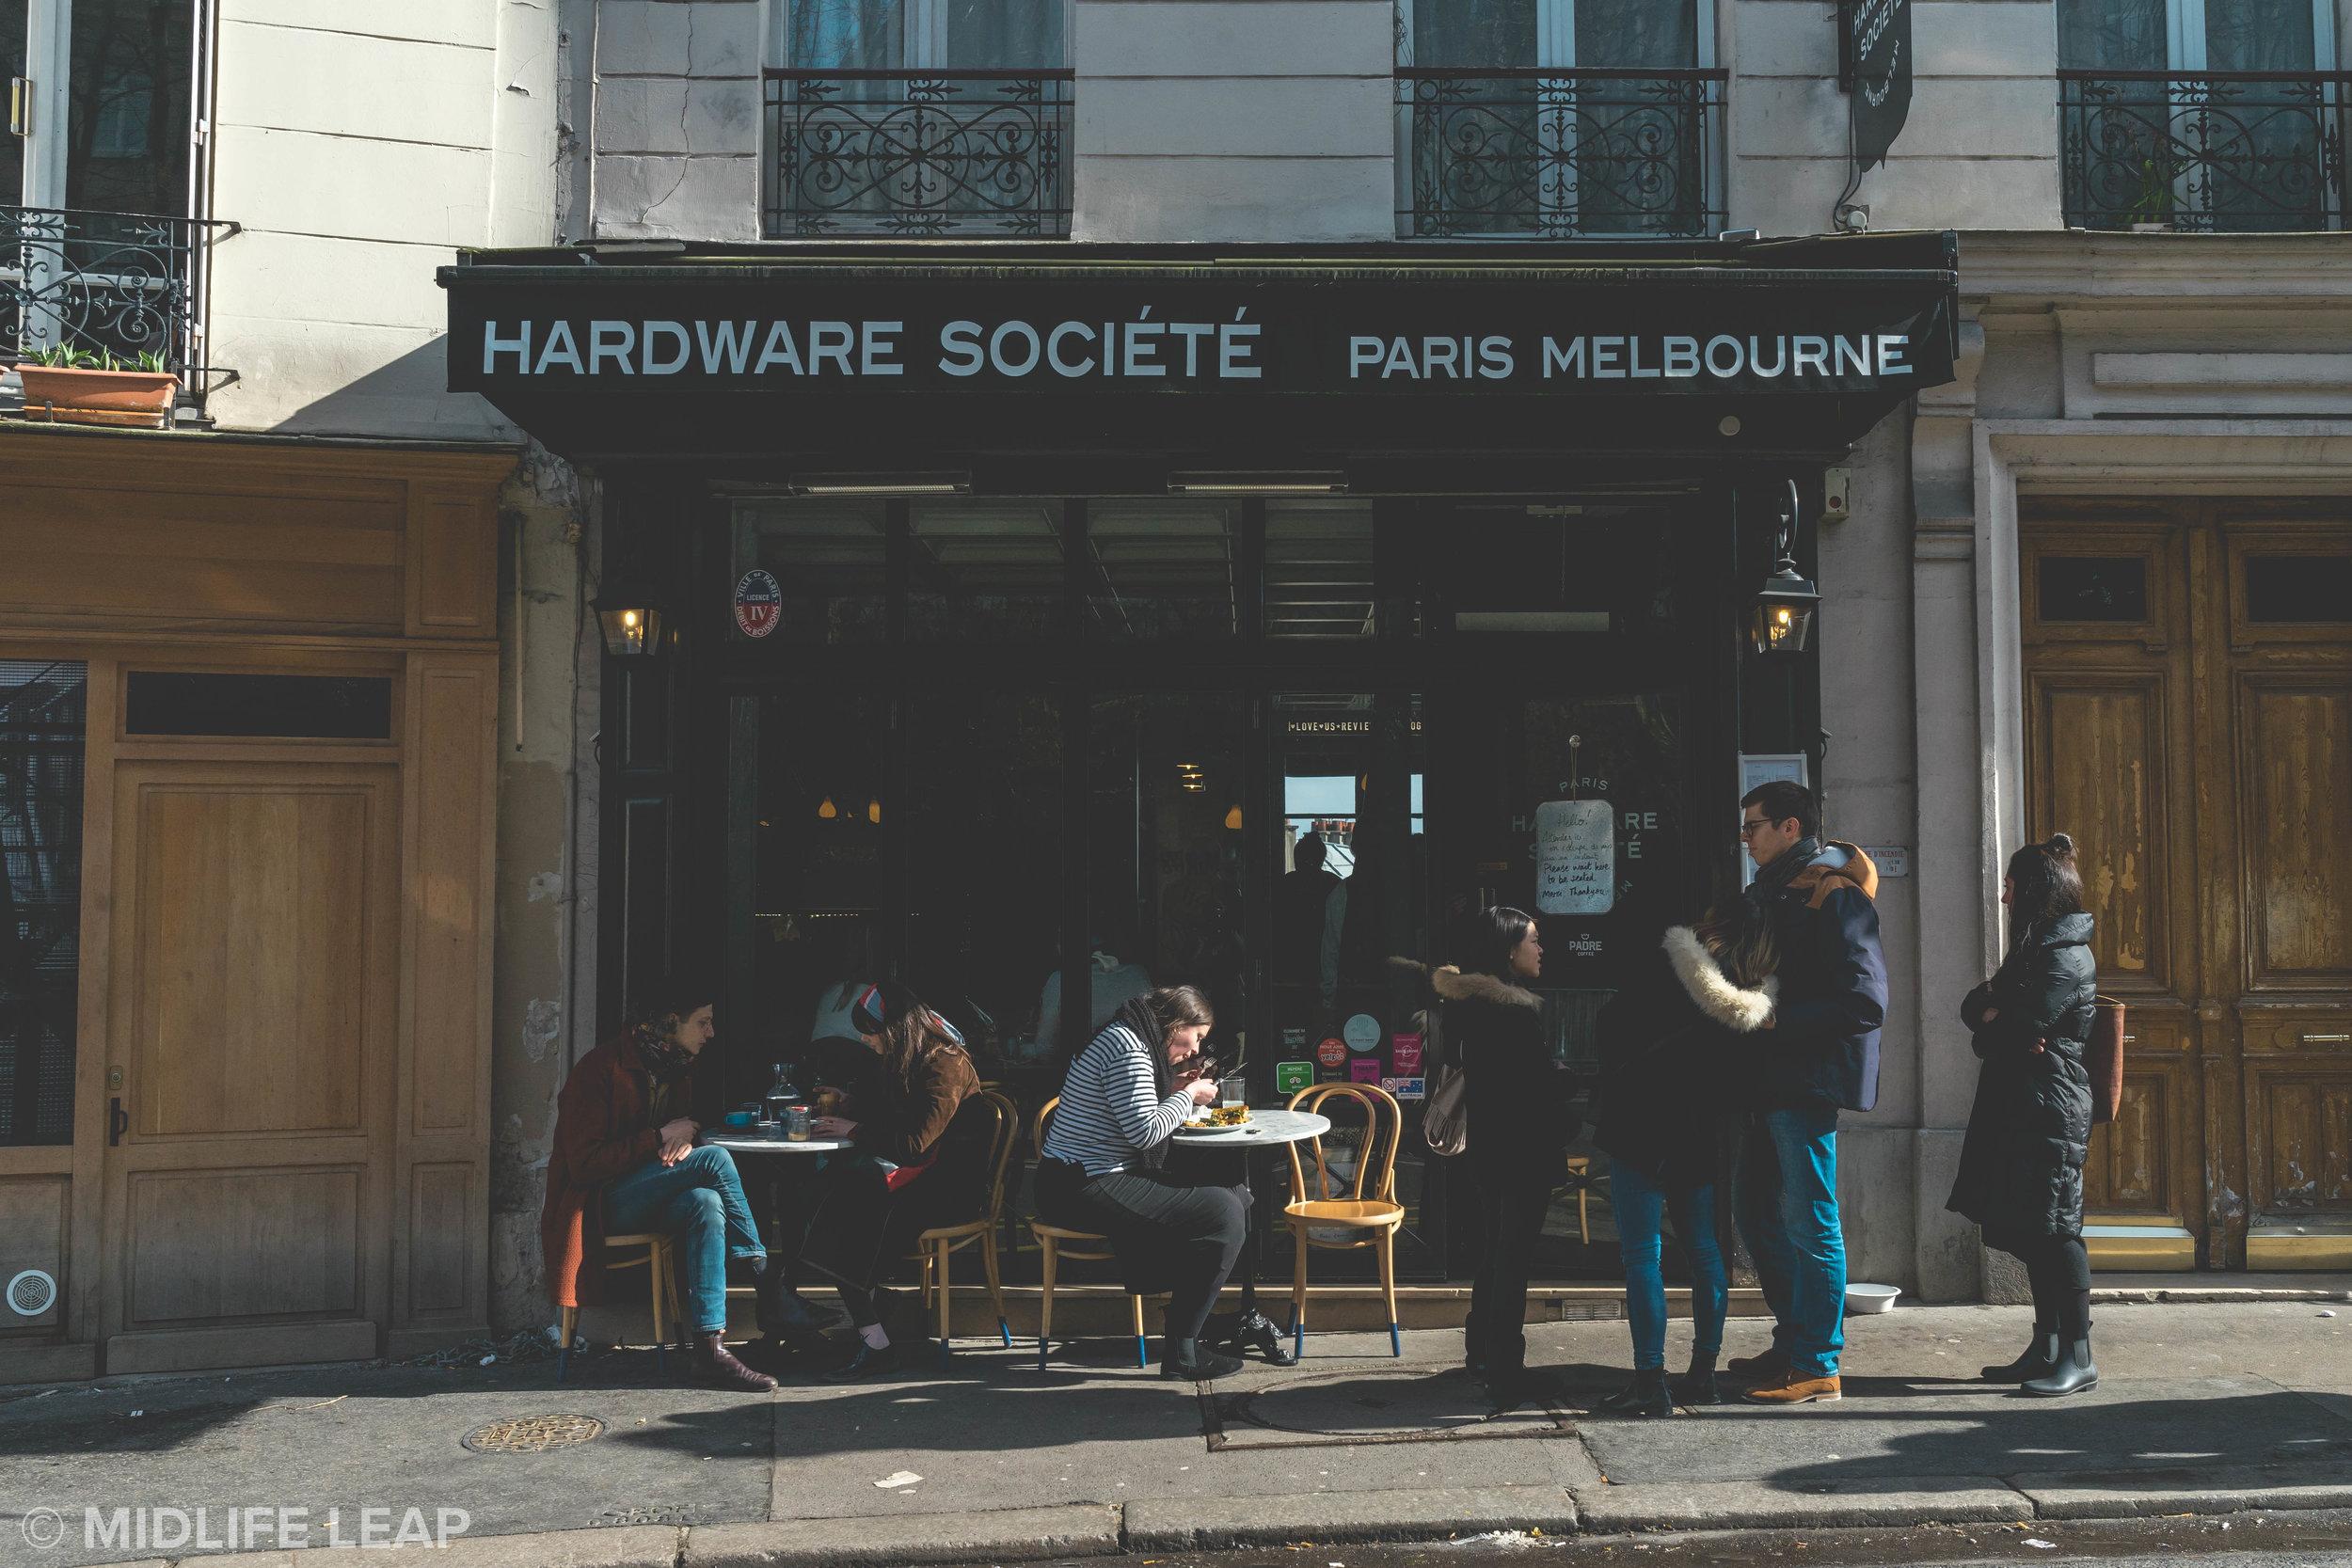 hardware-societe-where-to-eat-in-montmartre-18th-arrondissement-paris